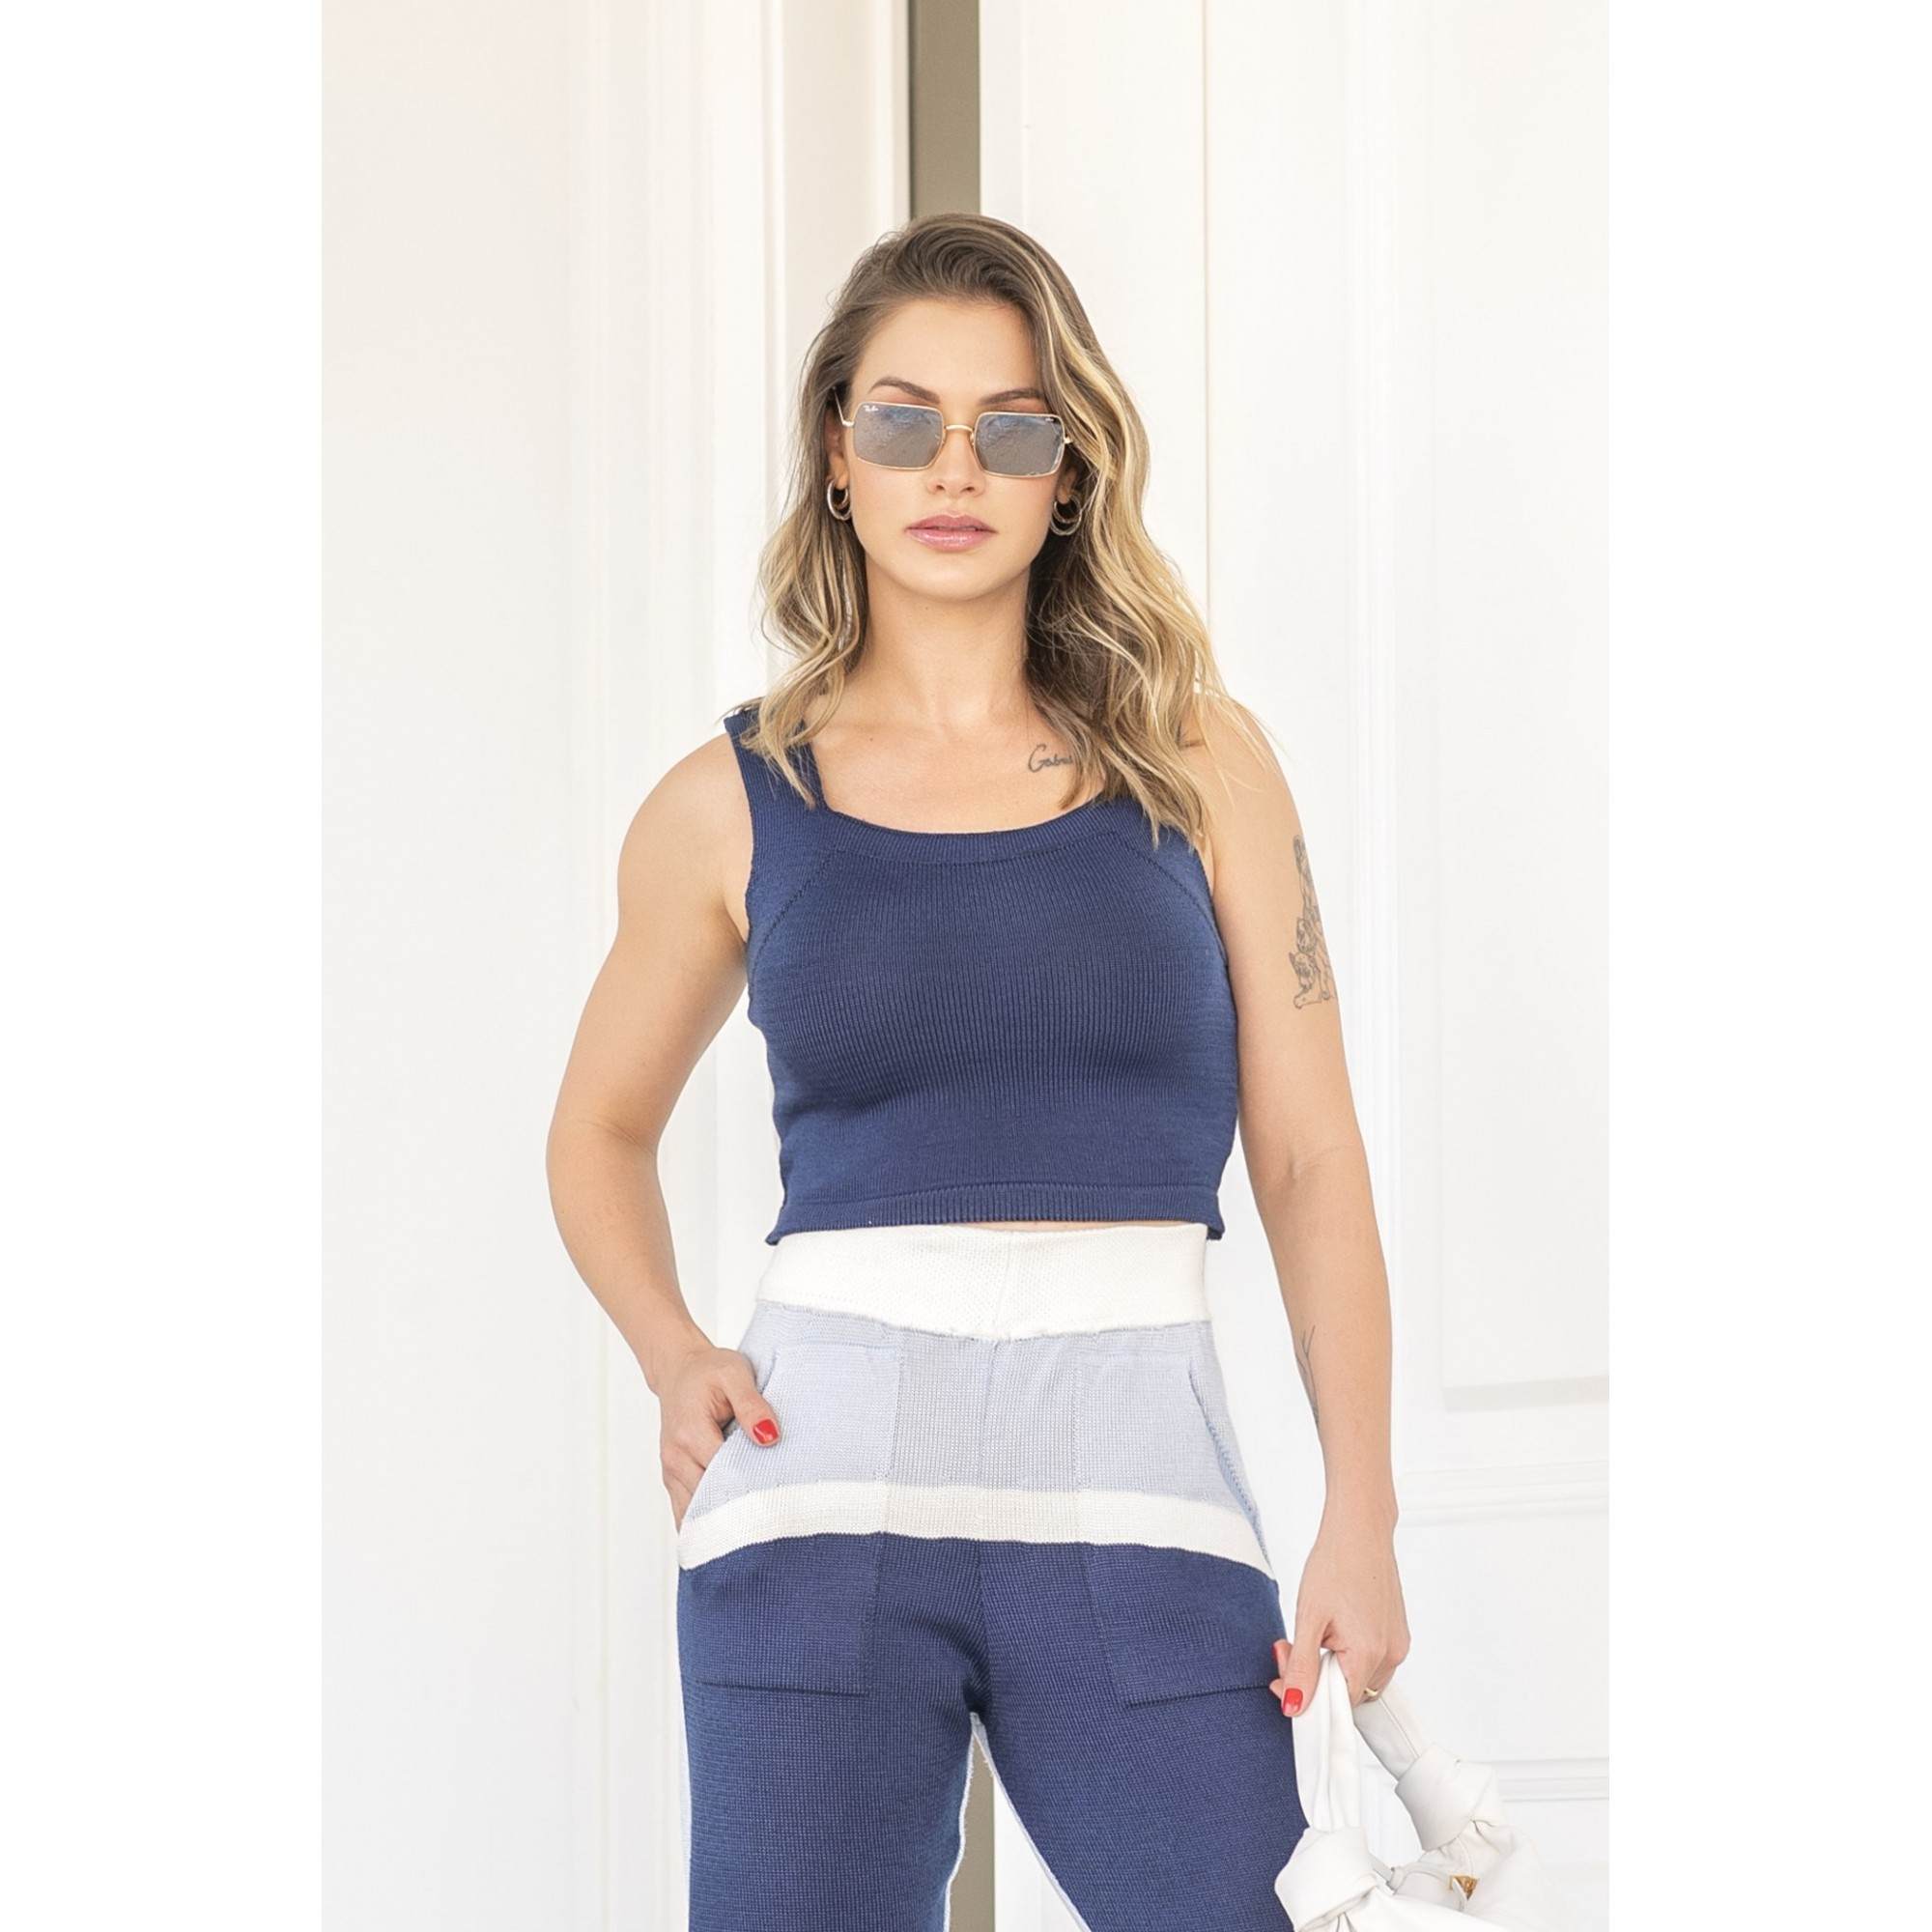 Blusa Larissa Vera Tricot Feminino Cropped Marinho